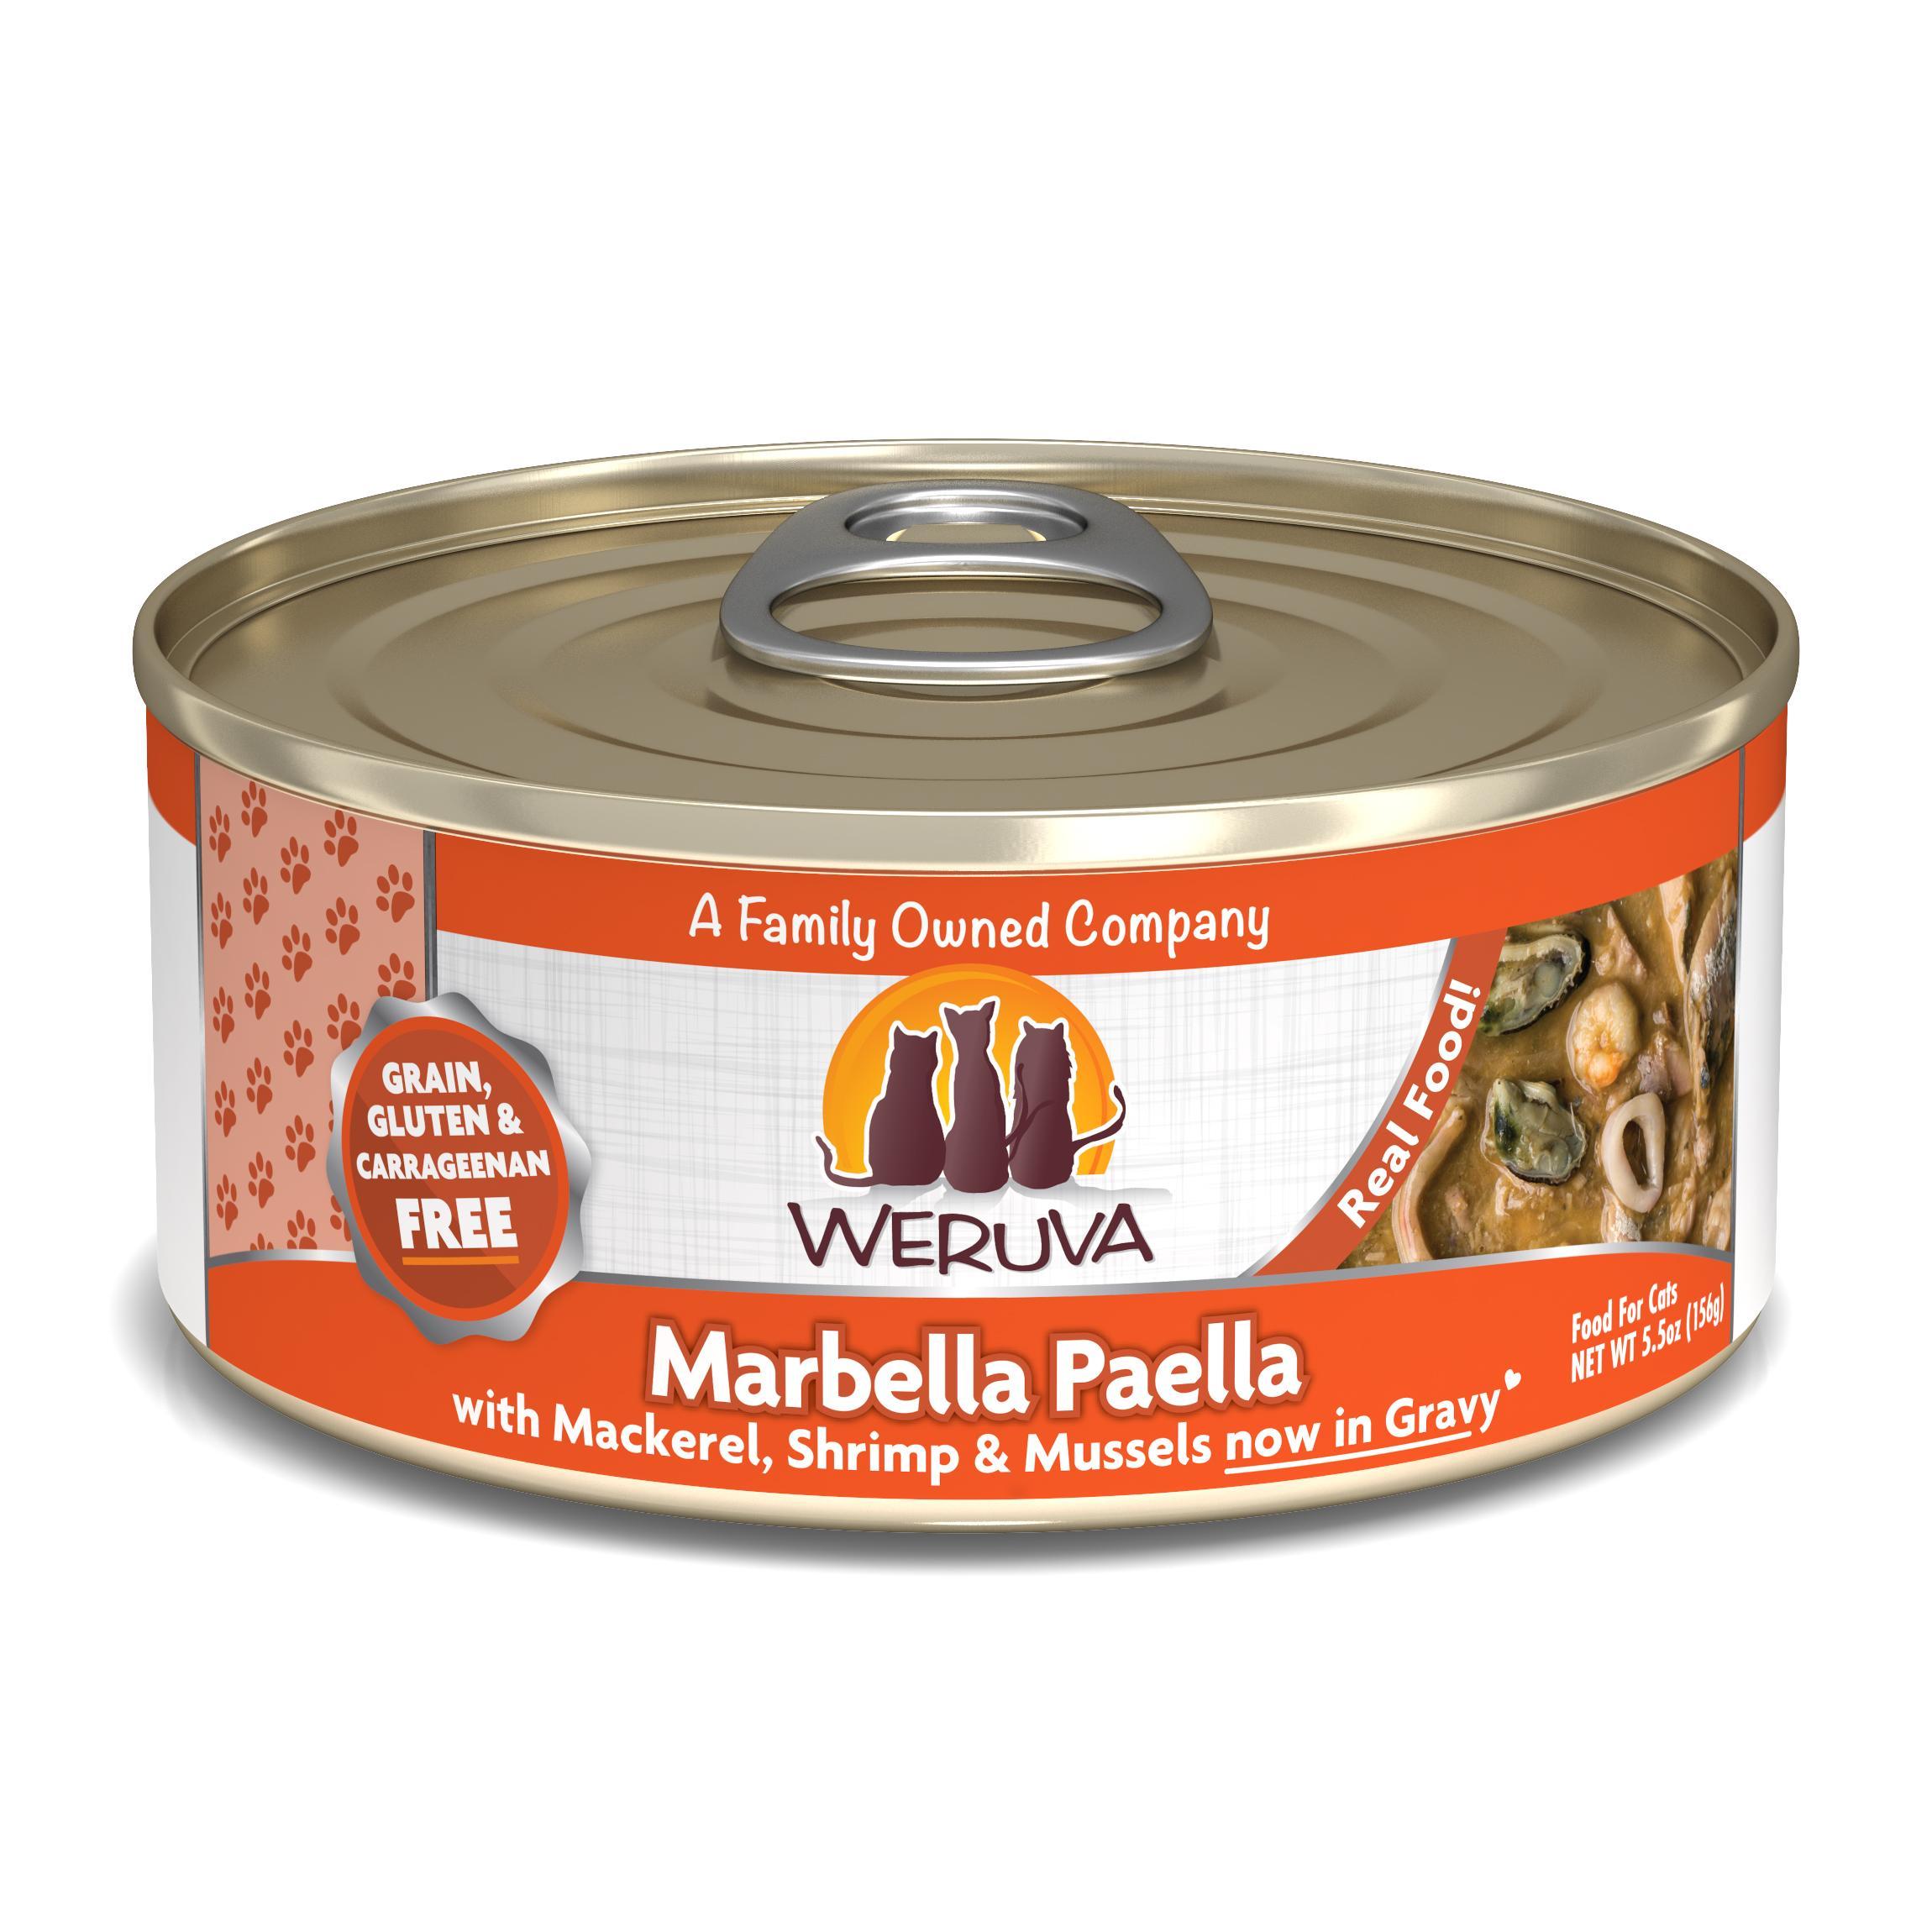 Weruva Cat Classic Marbella Paella with Mackerel, Shrimp & Mussels Grain-Free Wet Cat Food, 5.5-oz